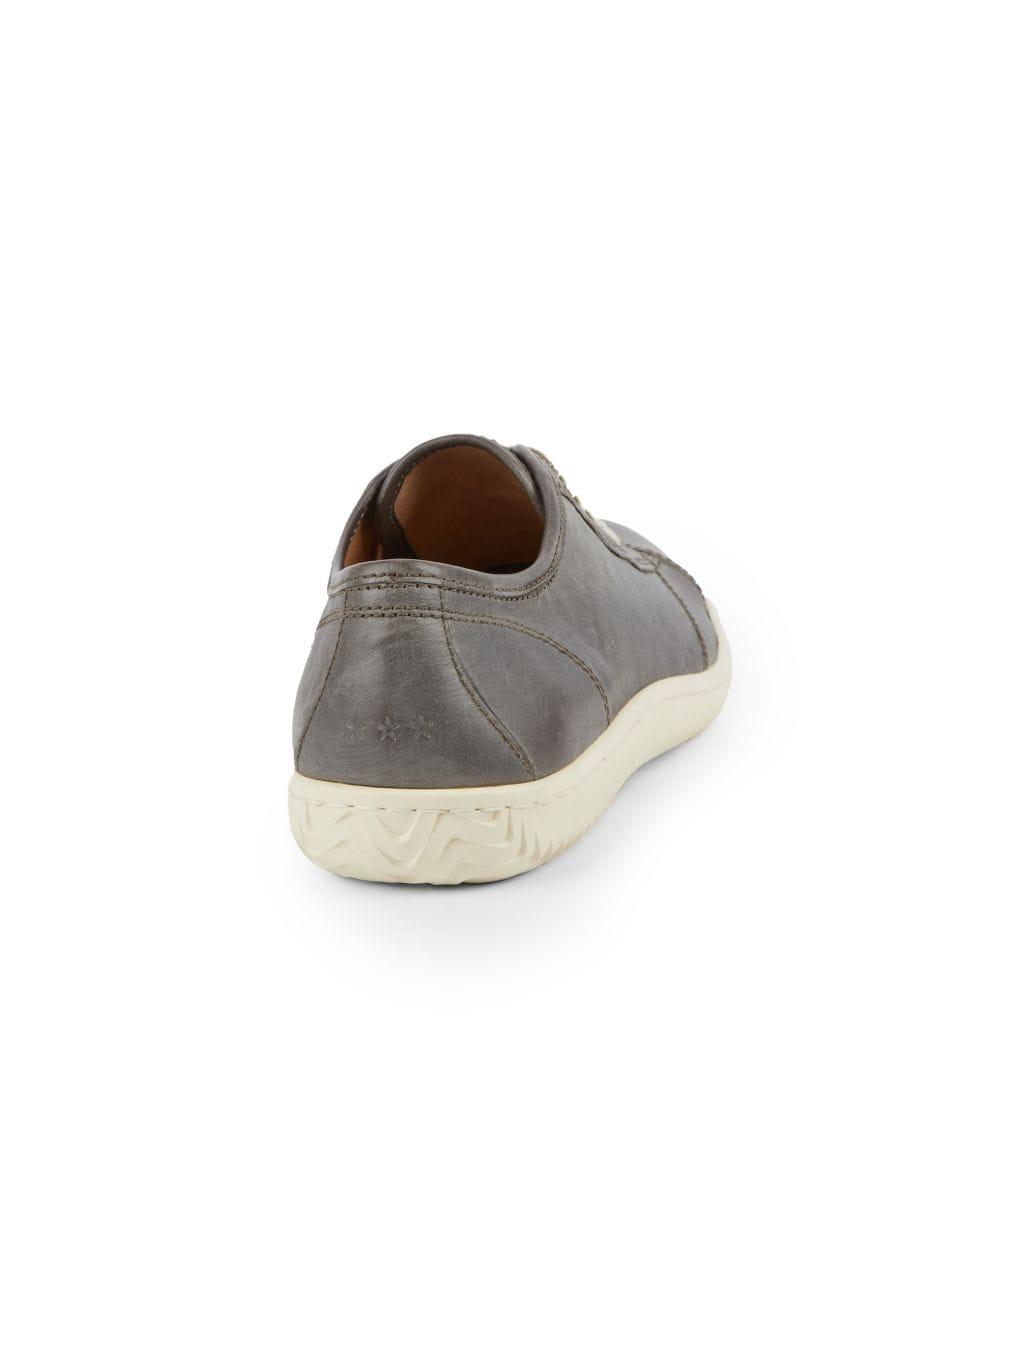 John Varvatos Star H Leather Low-Top Sneakers